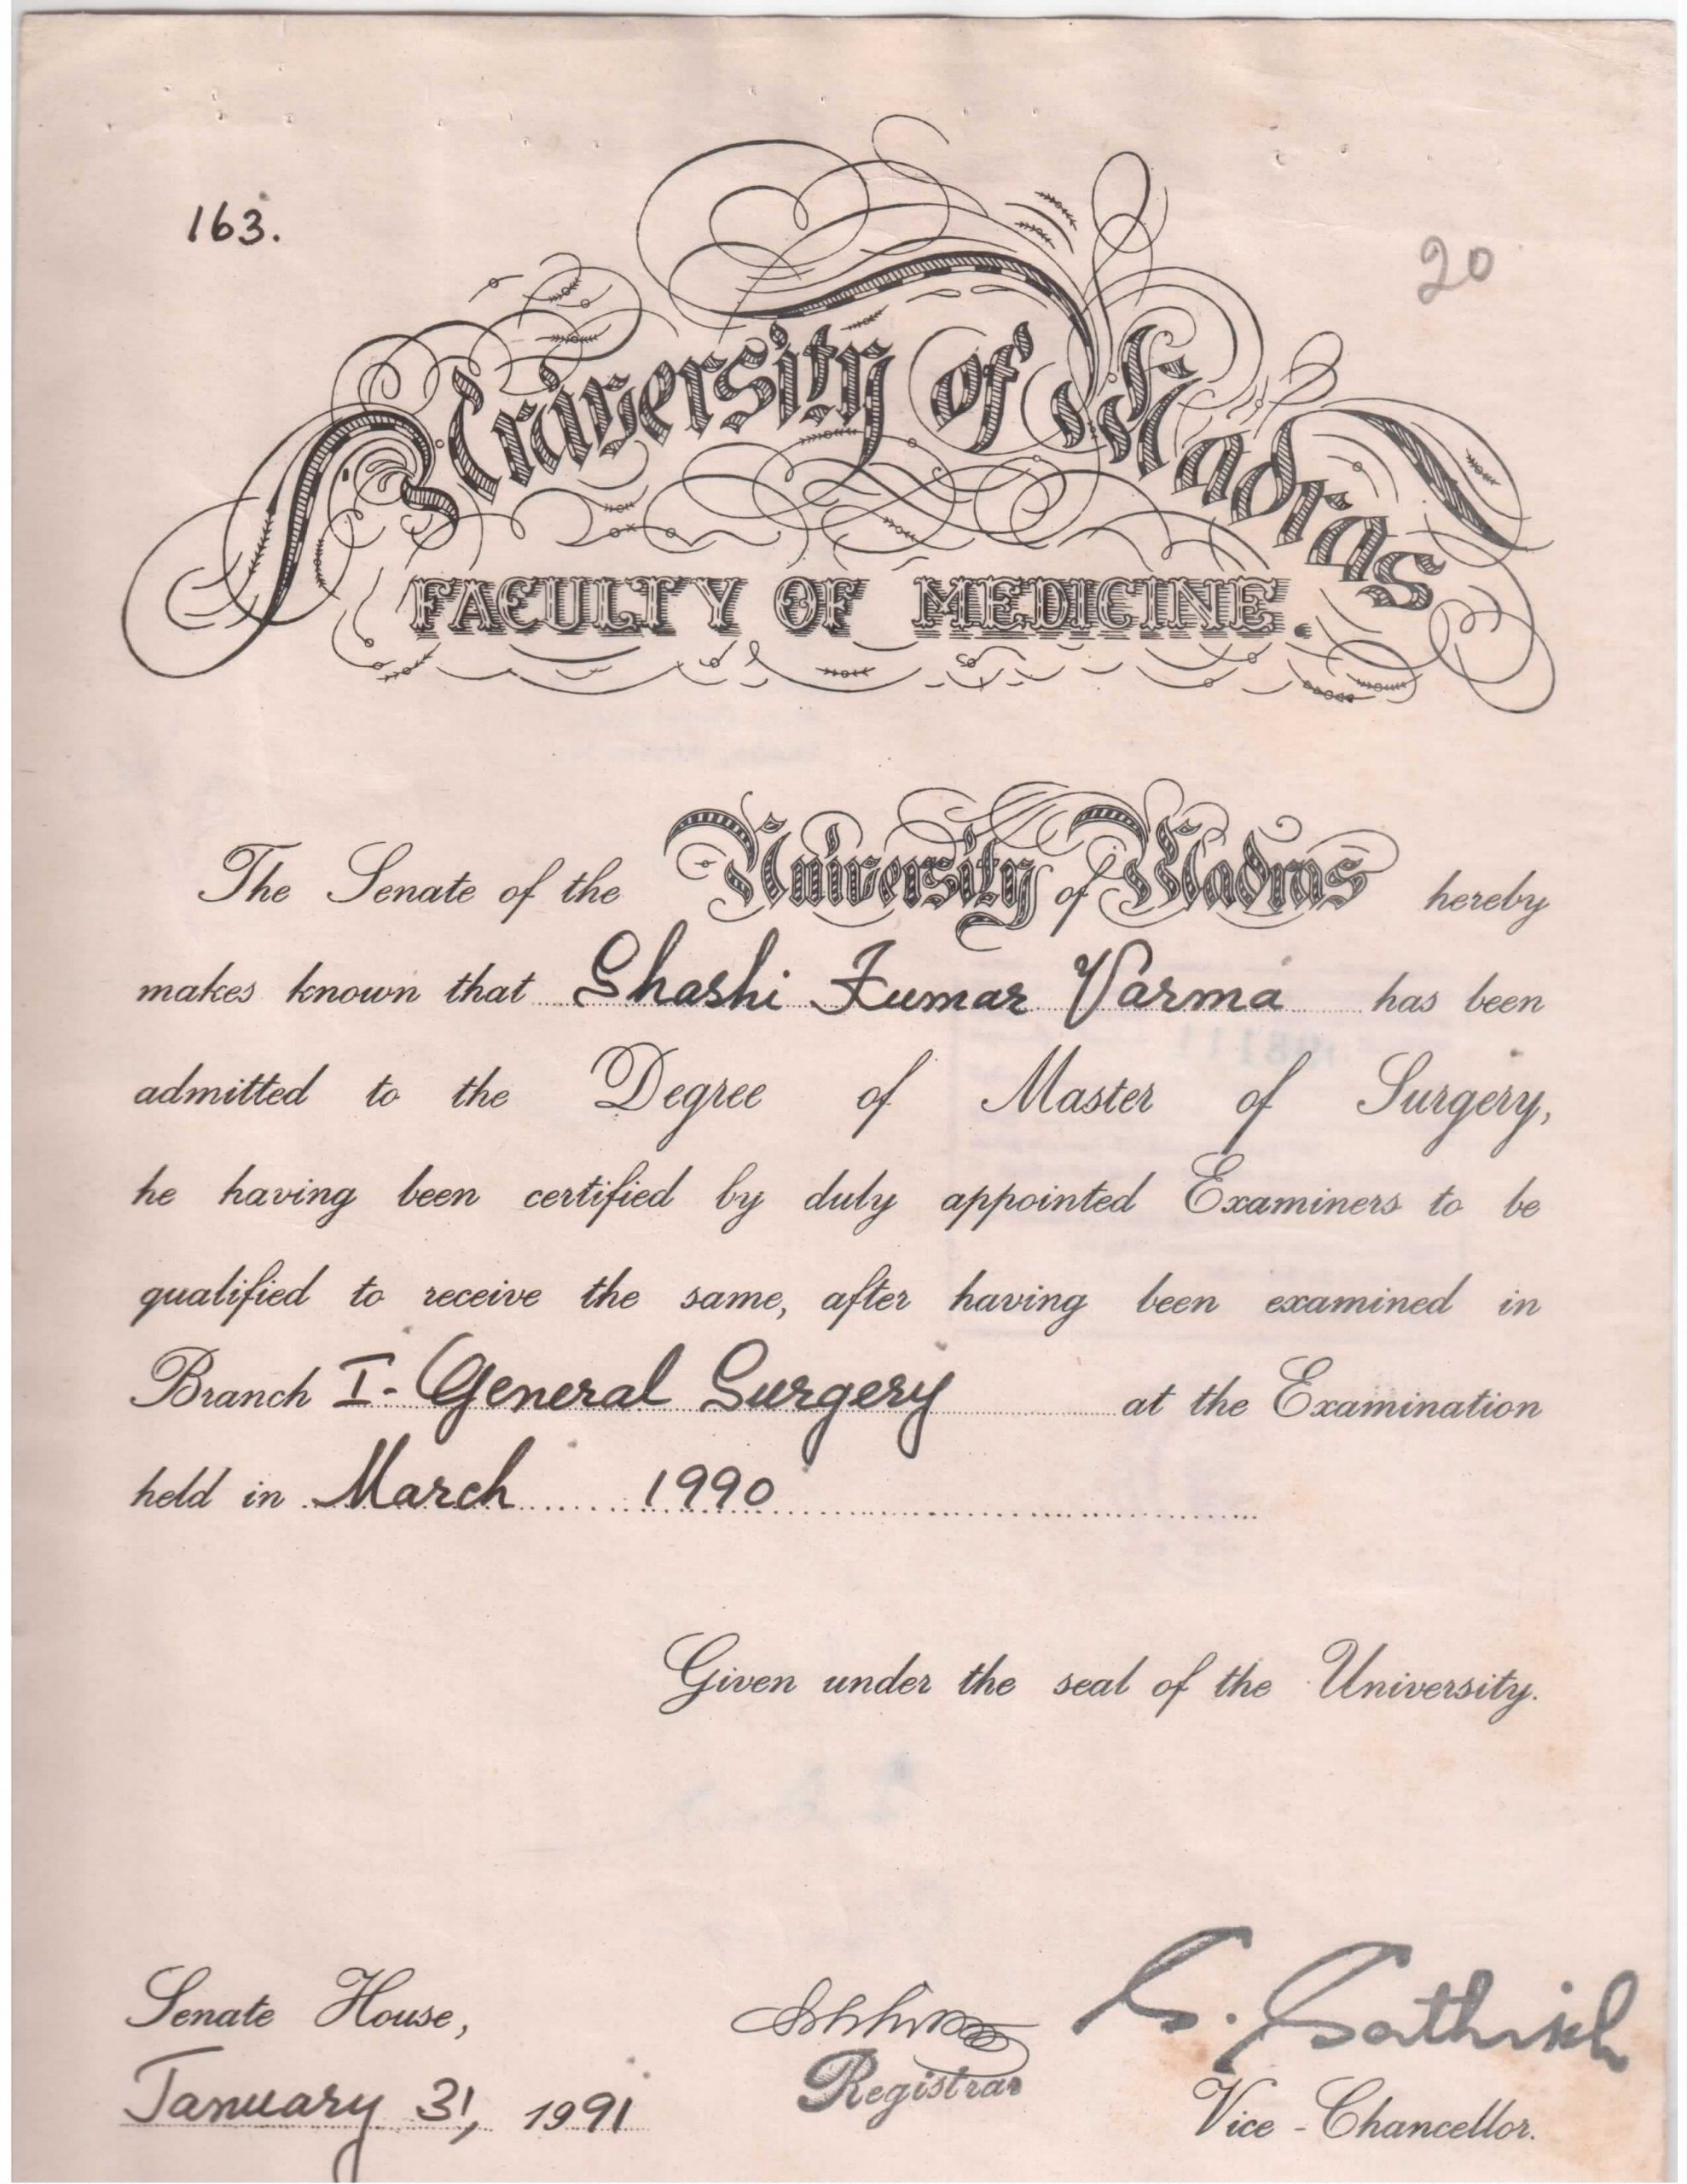 SK Varma (MS Certificate)